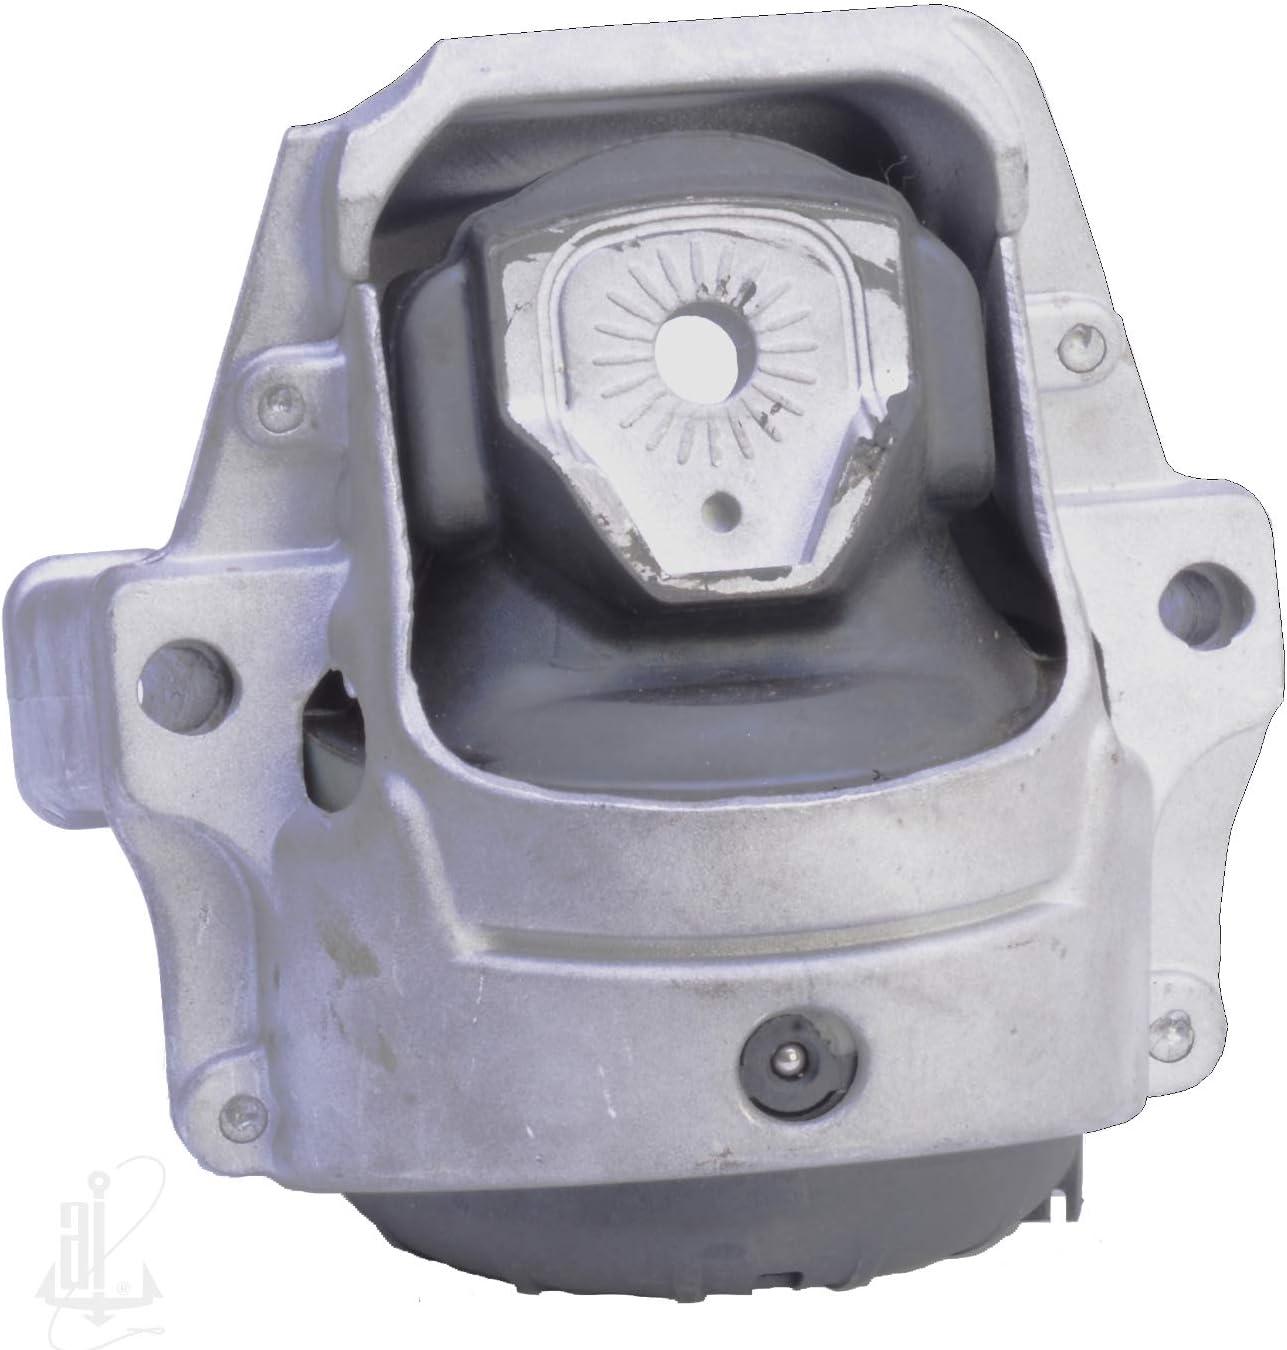 Anchor 9244 Engine Mount